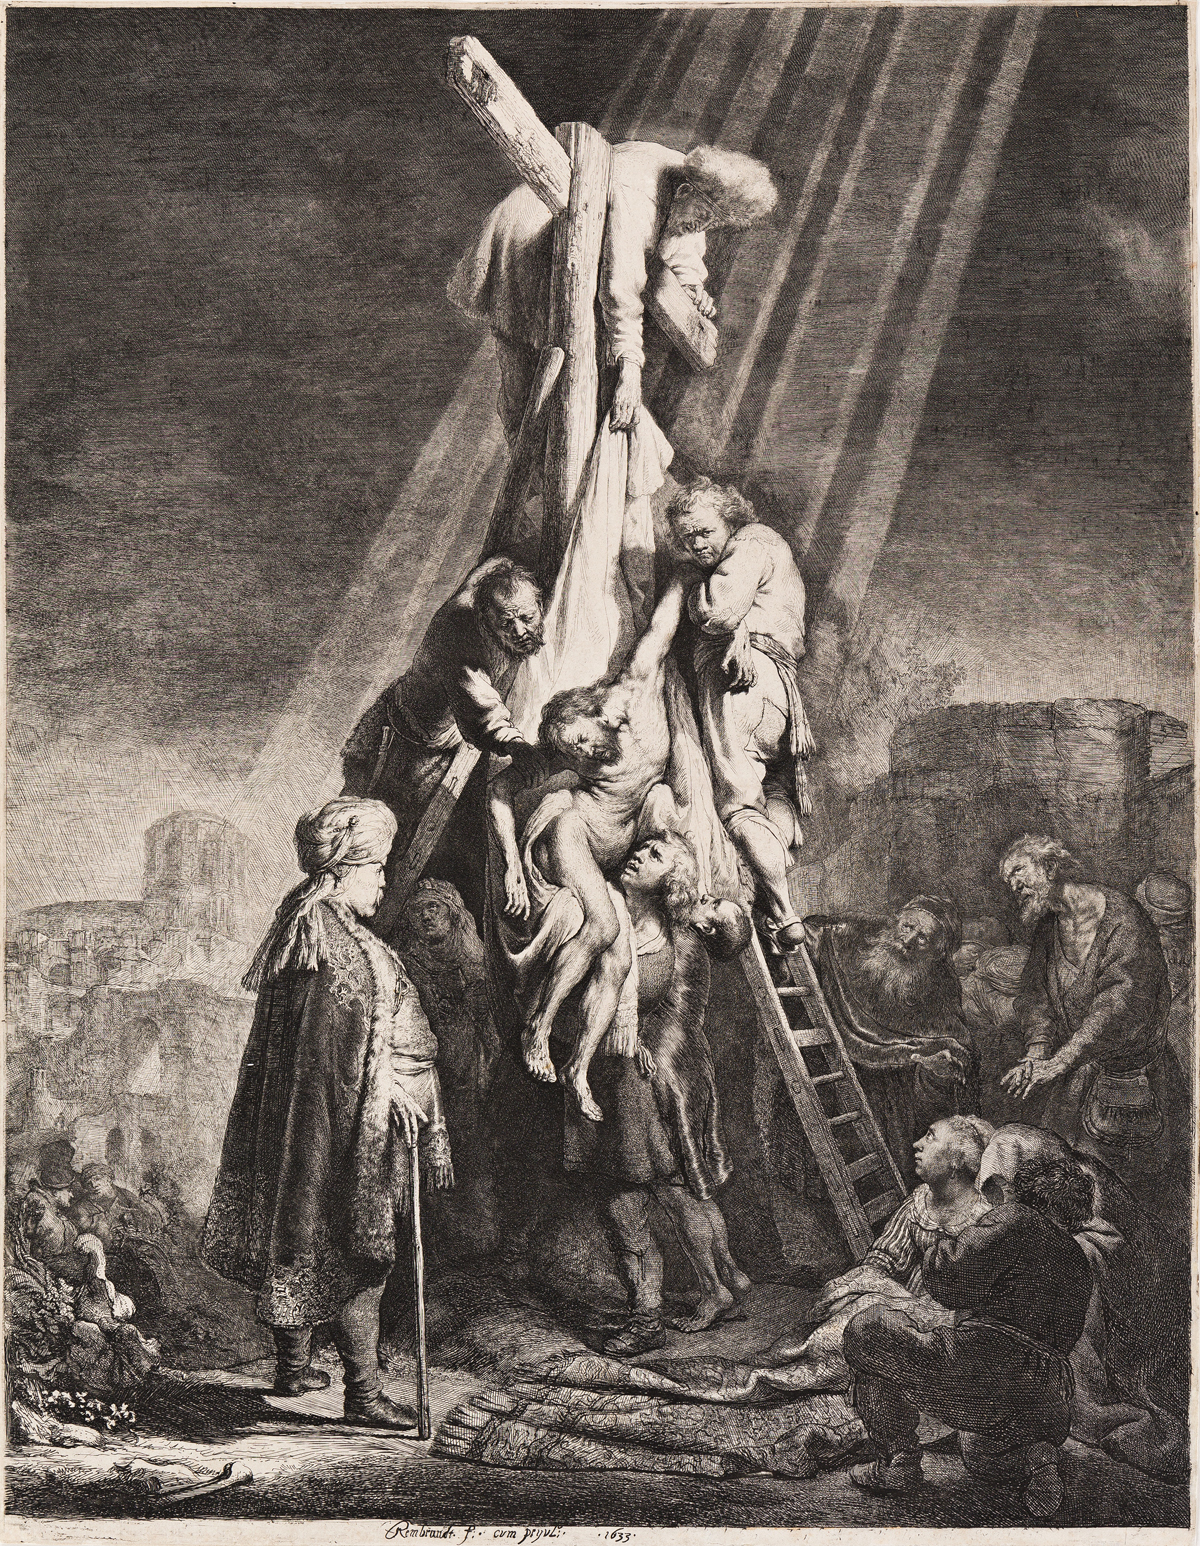 REMBRANDT VAN RIJN The Descent from the Cross: Second Plate.